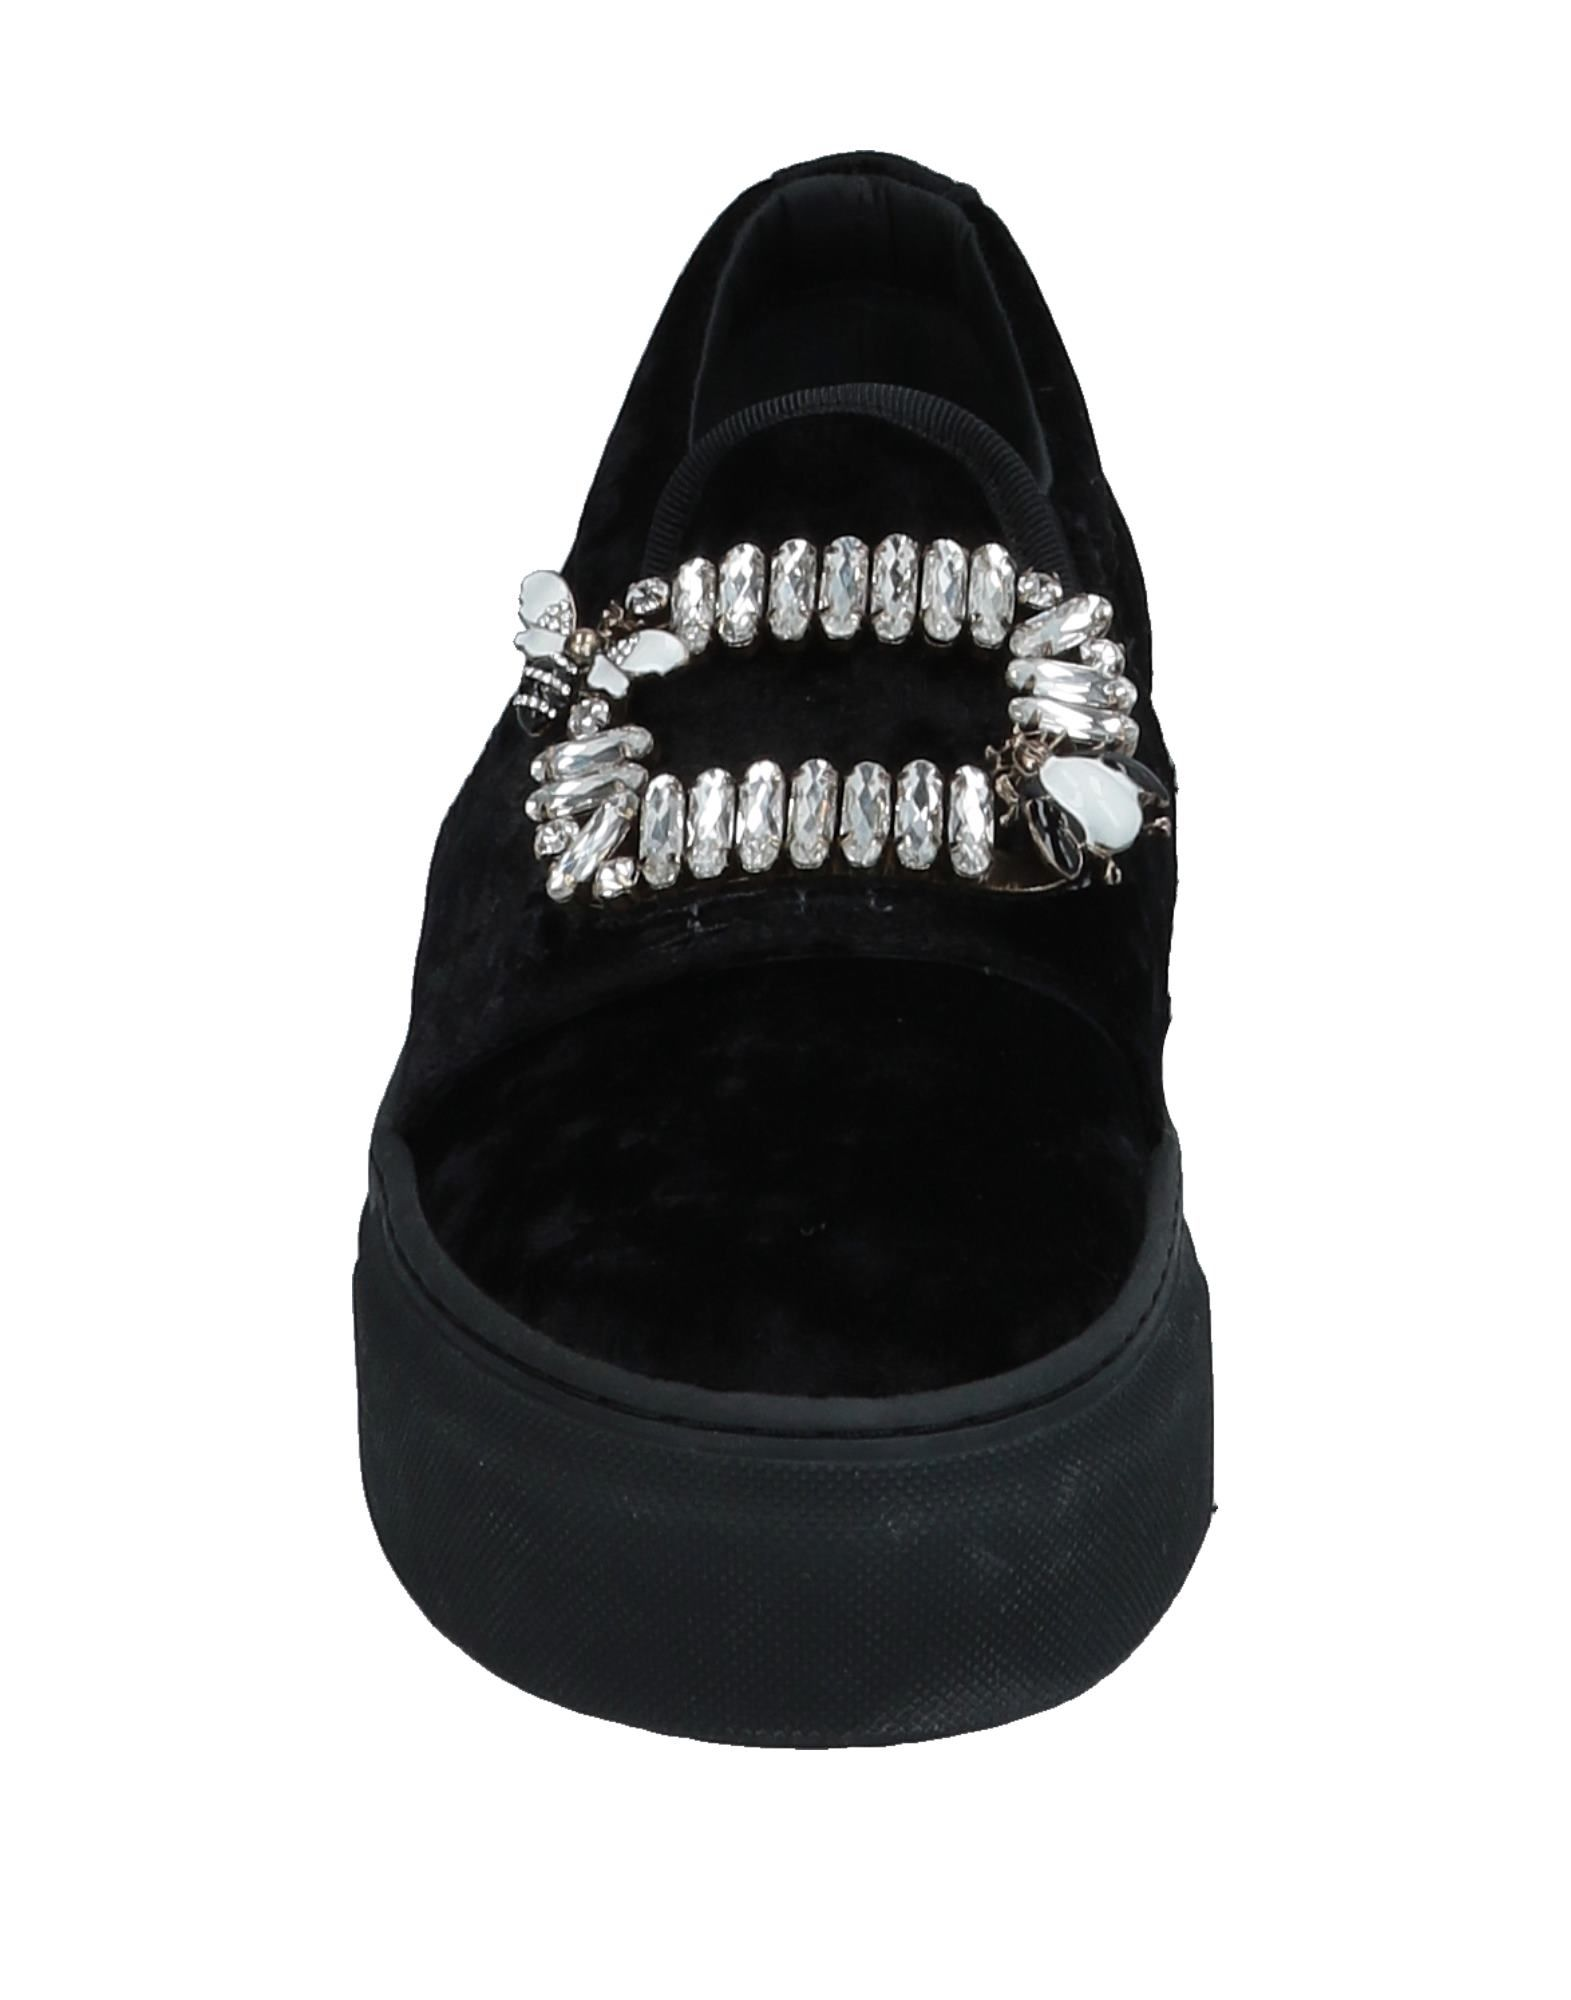 Gut um Sneakers billige Schuhe zu tragenRas Sneakers um Damen  11509323CO 9f856b